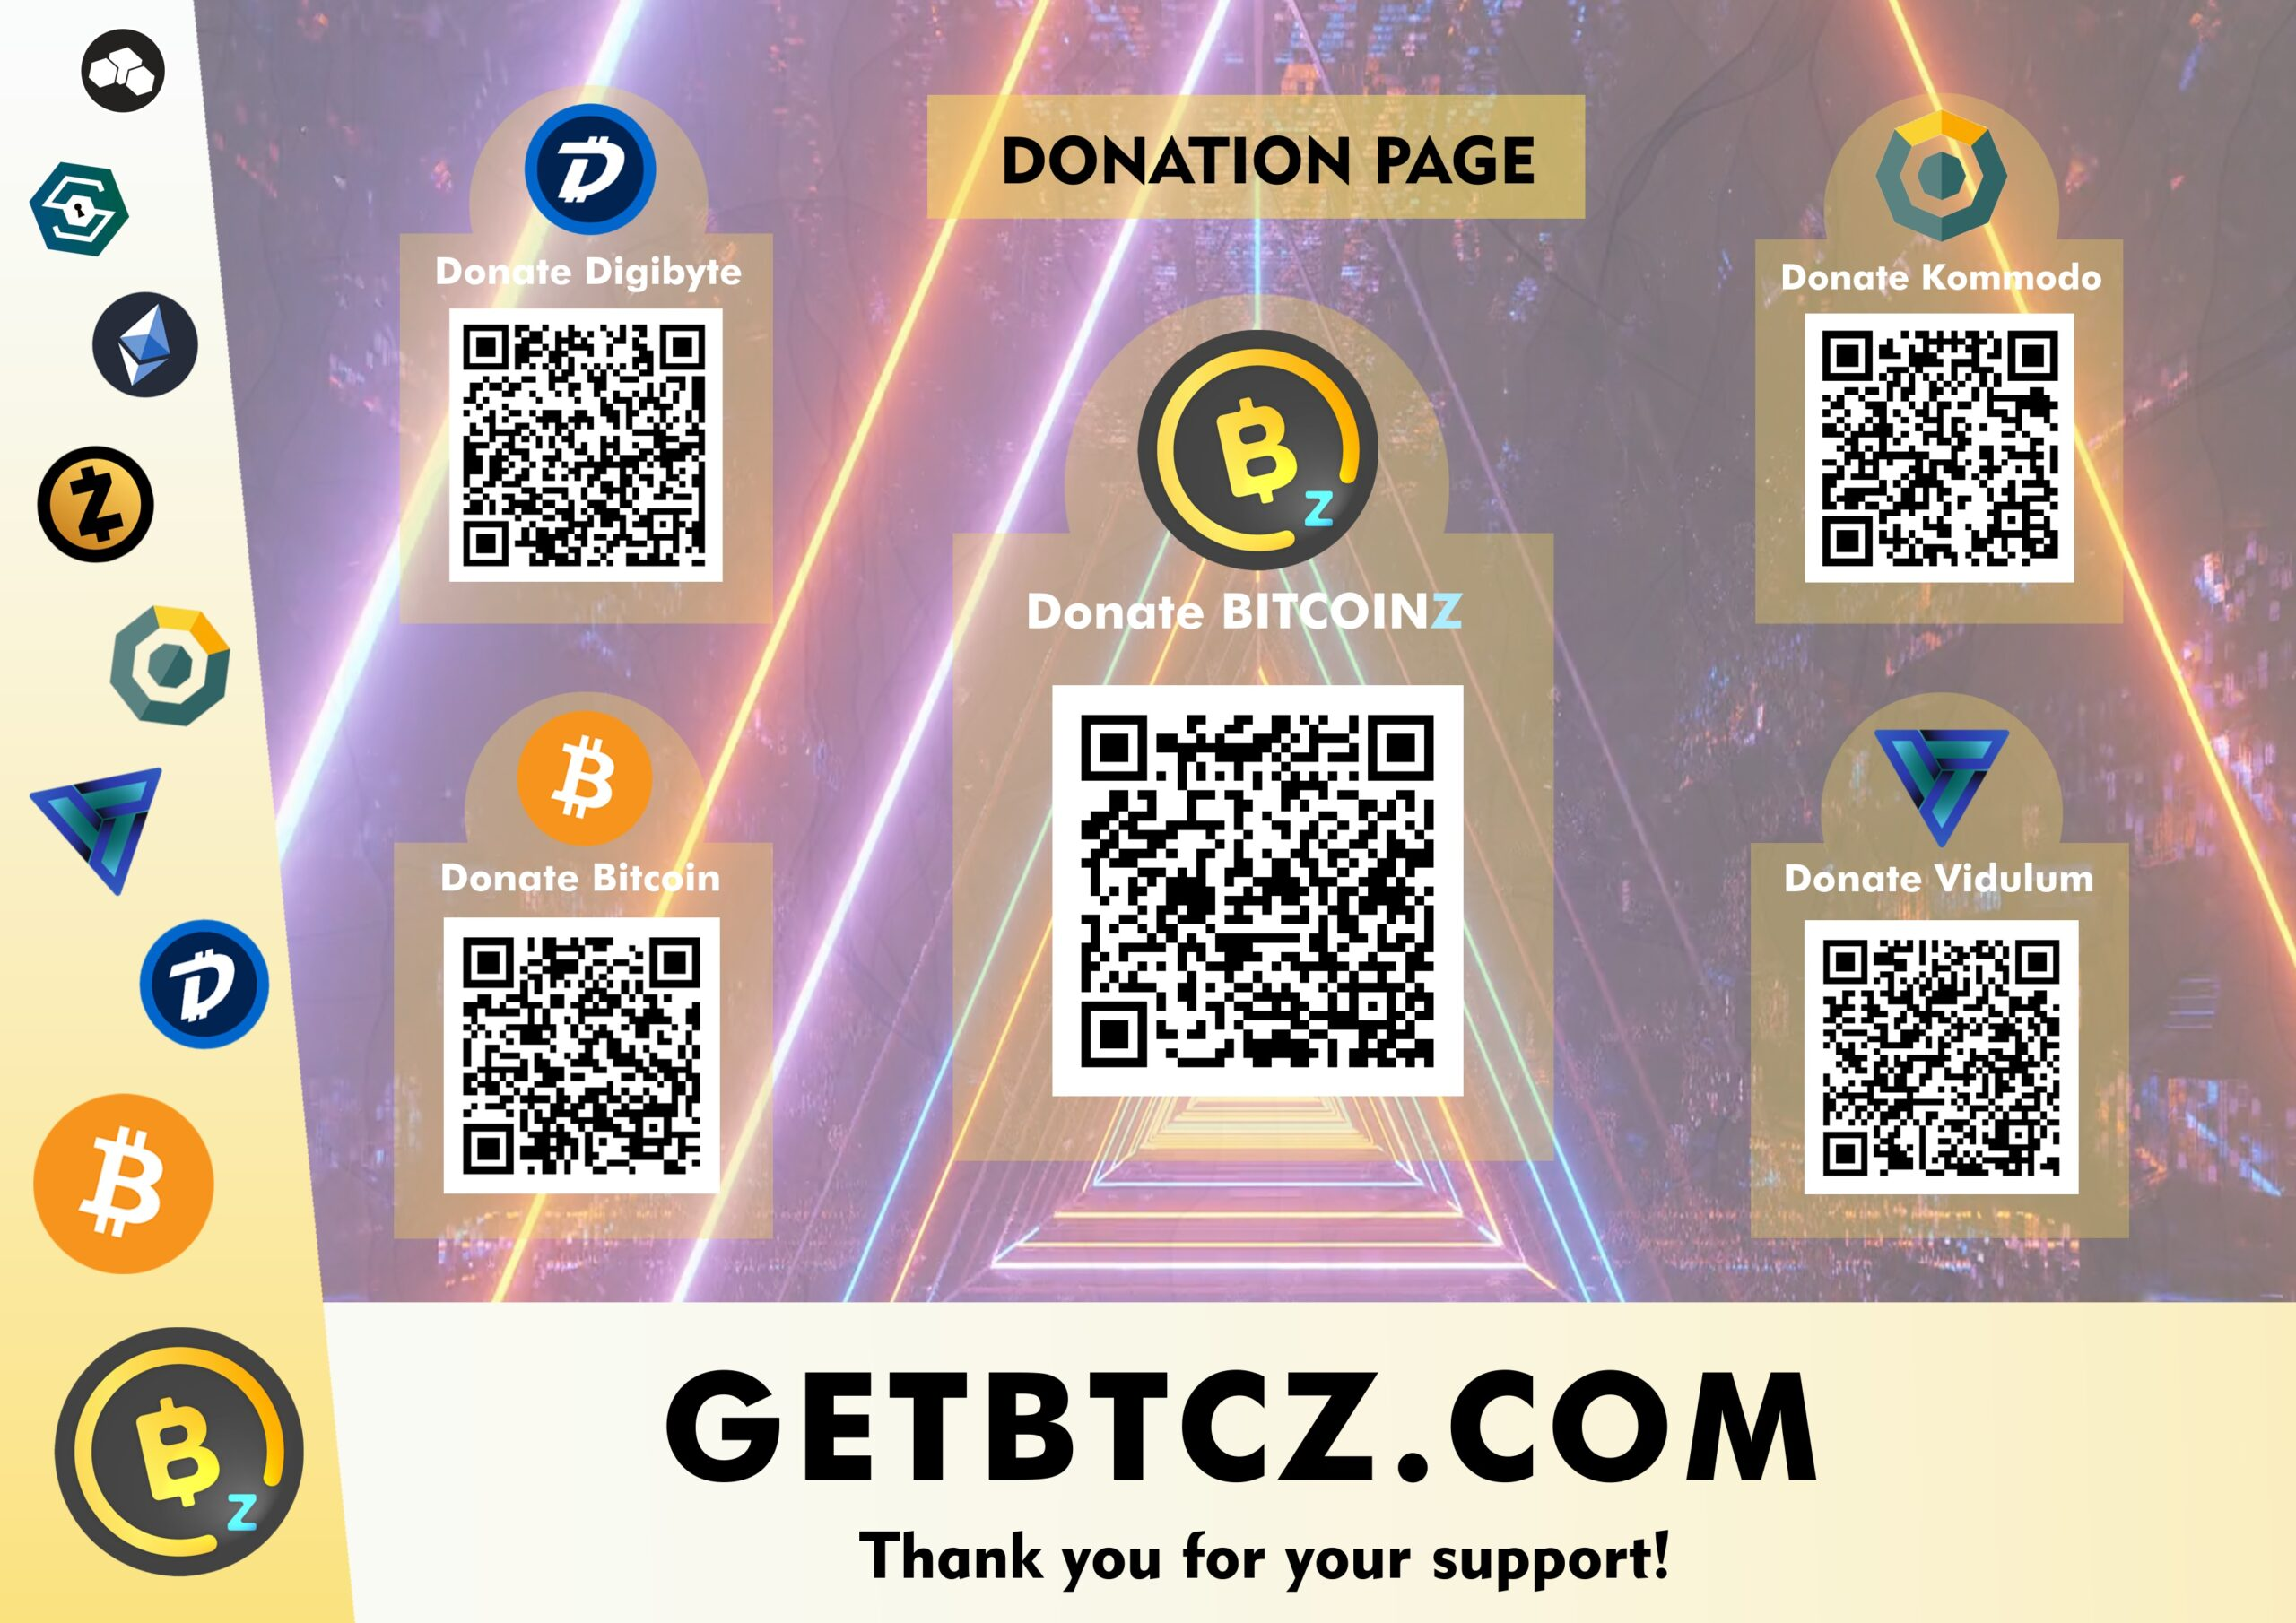 Donate BitcoinZ